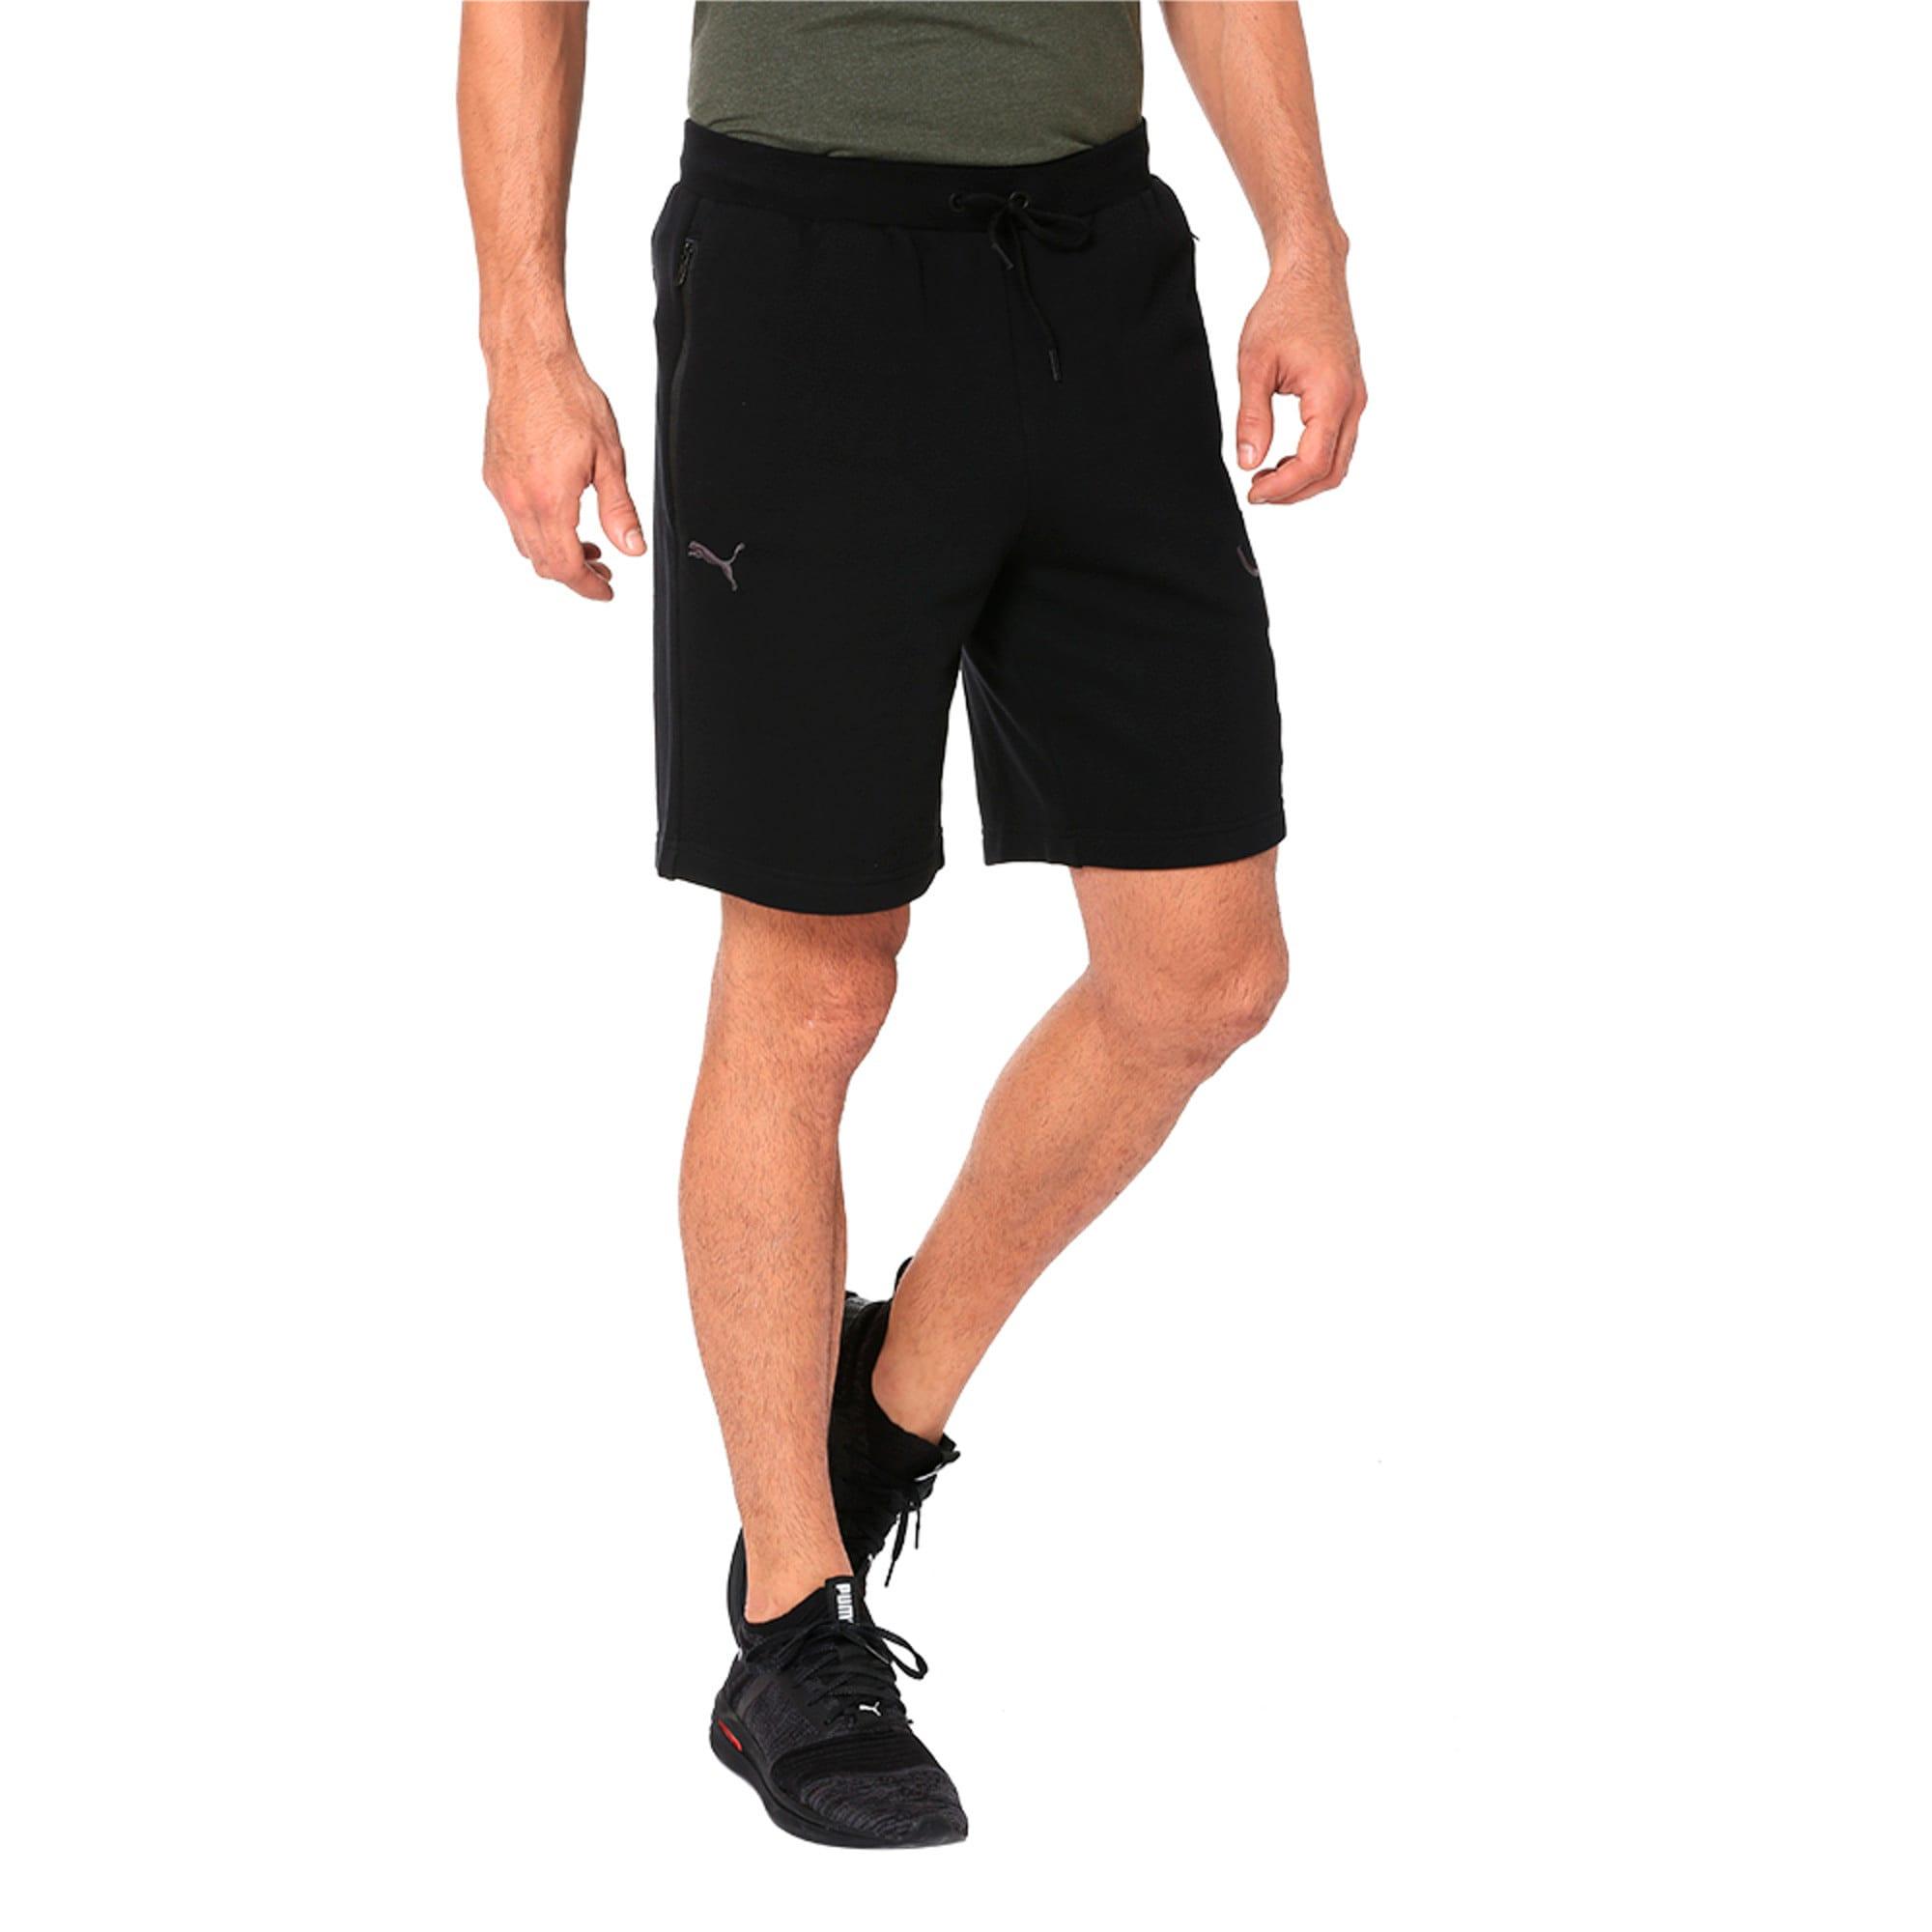 Thumbnail 1 of One8 VK Men's Sweat Shorts, Puma Black, medium-IND